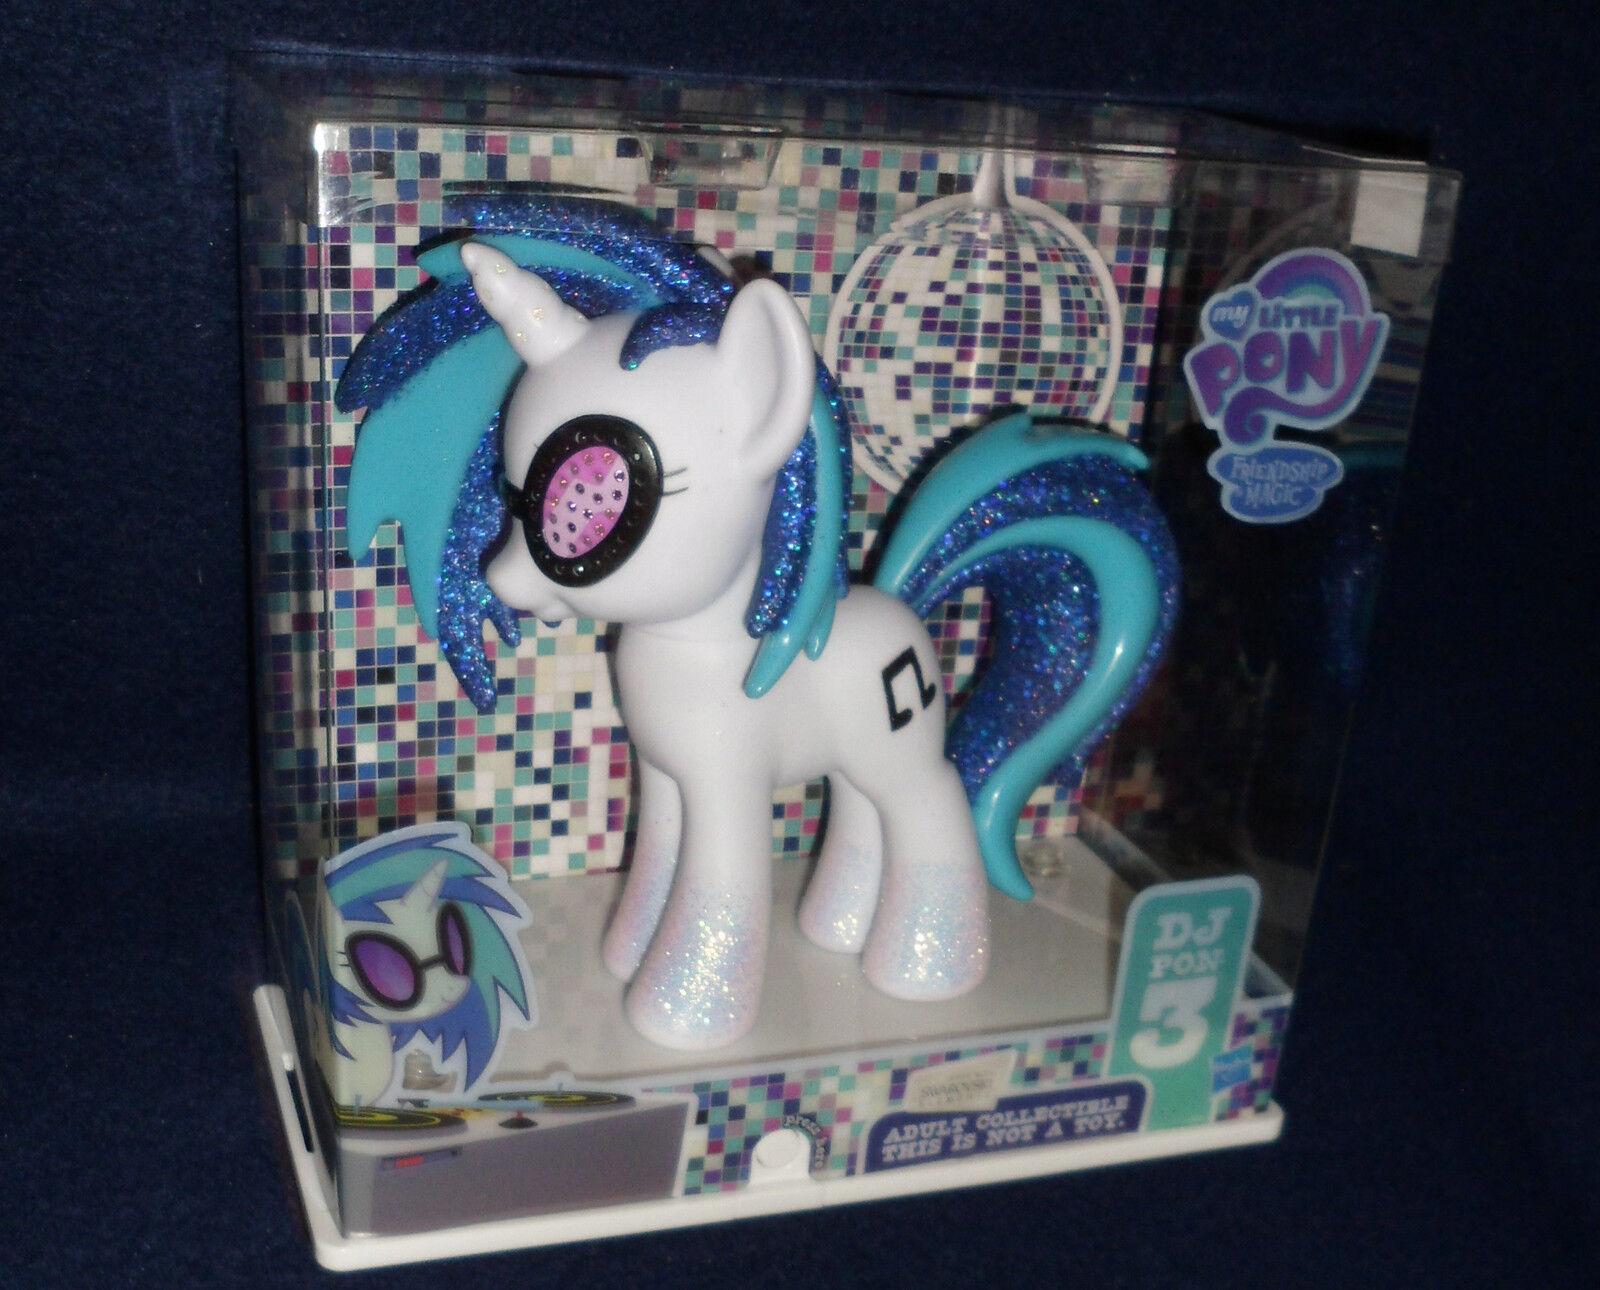 SDCC 2013 Exclusive My Little Pony: Frienship is Magic DJ PON-3 Figure Hasbro